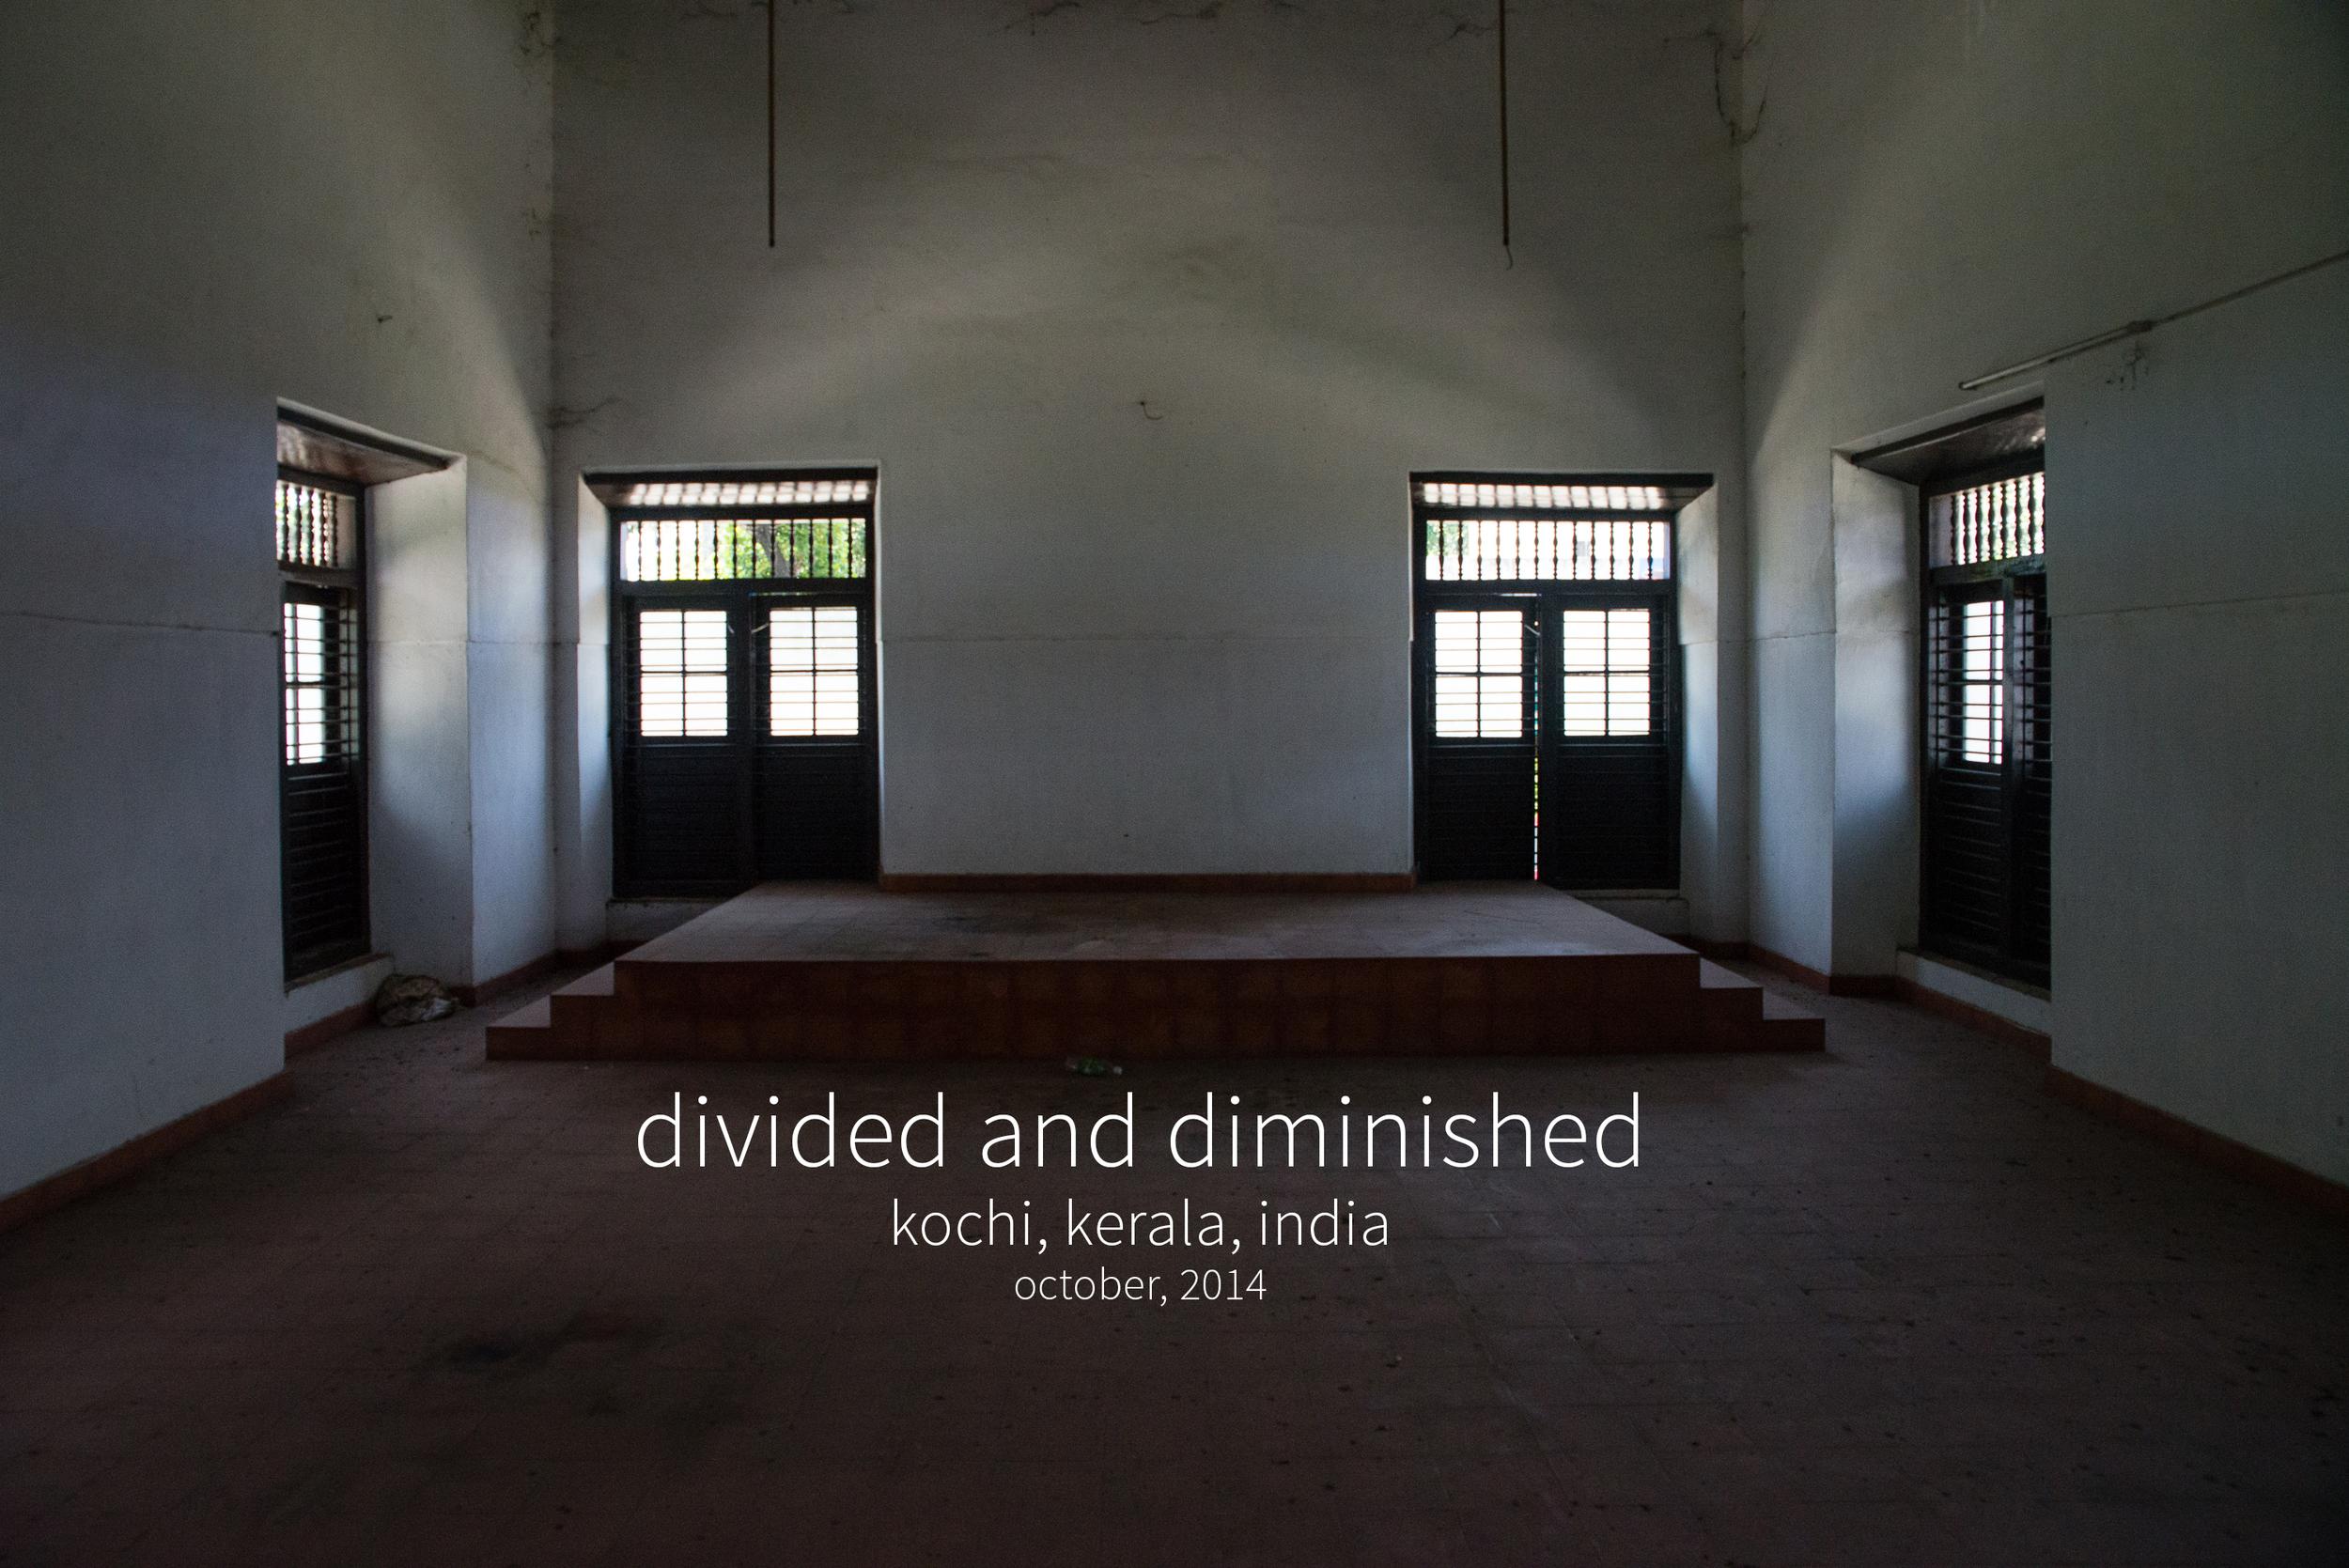 divided_diminished1500_AnnaClareSpelman_010.jpg